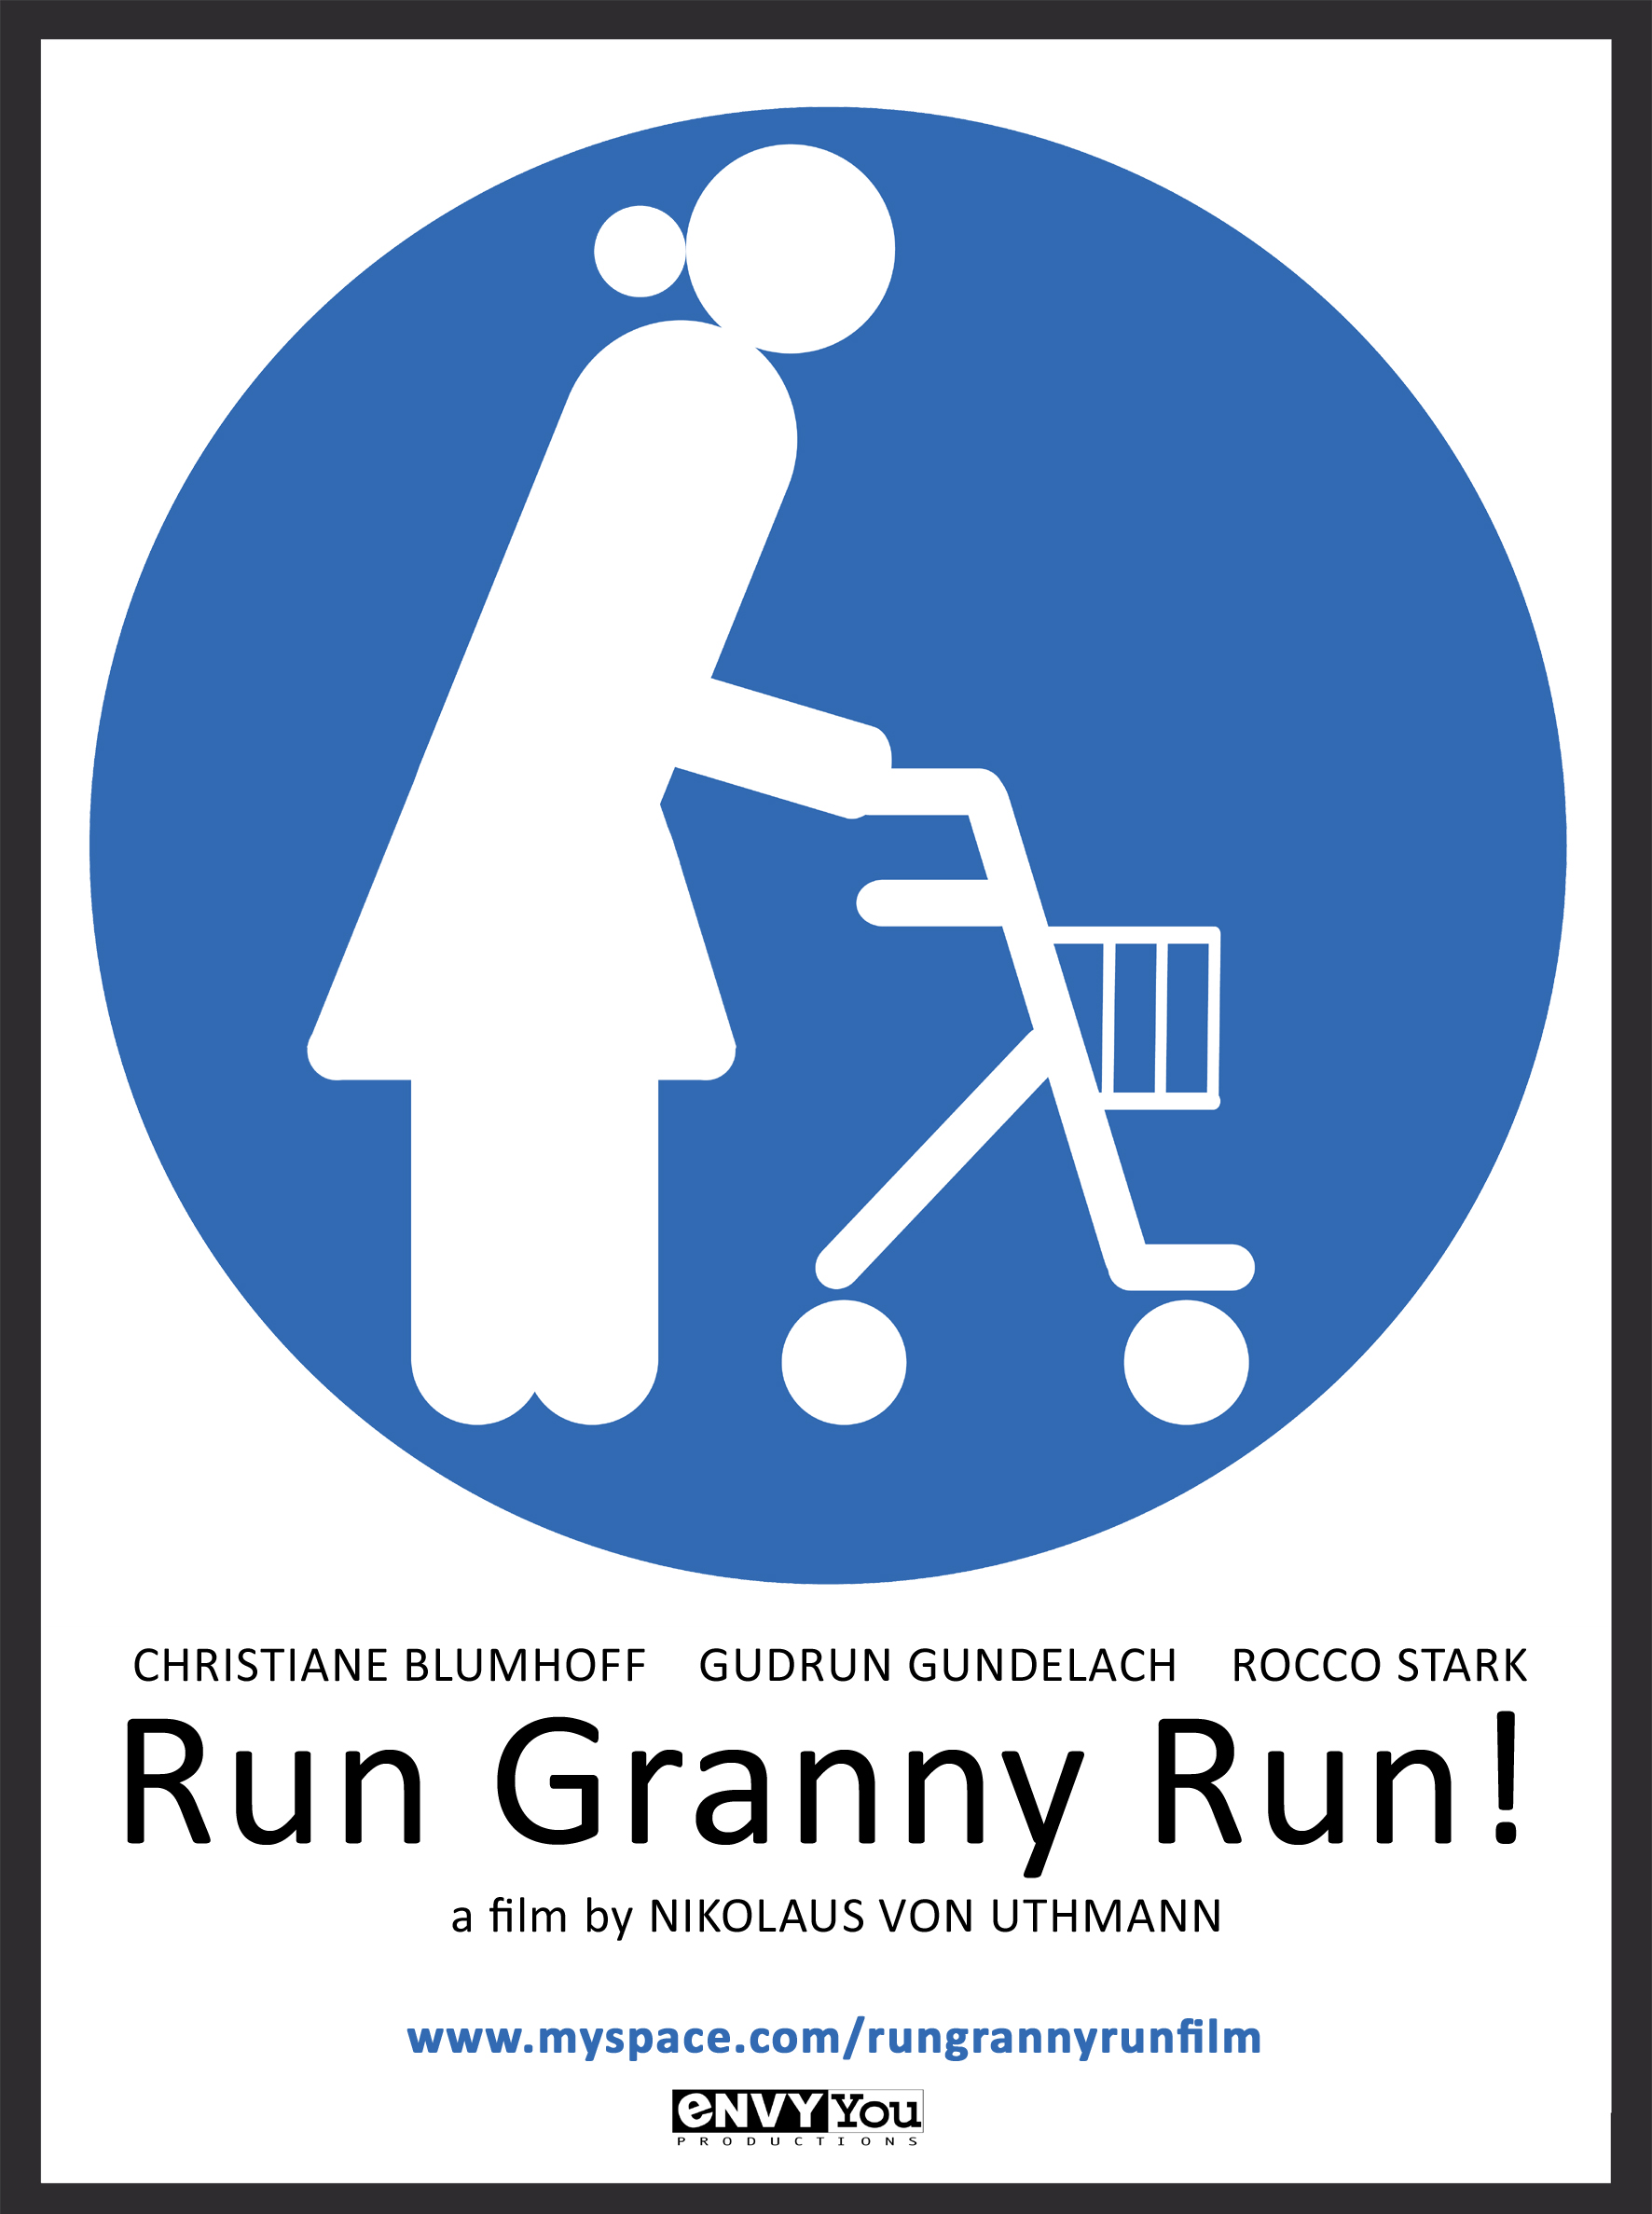 granny run